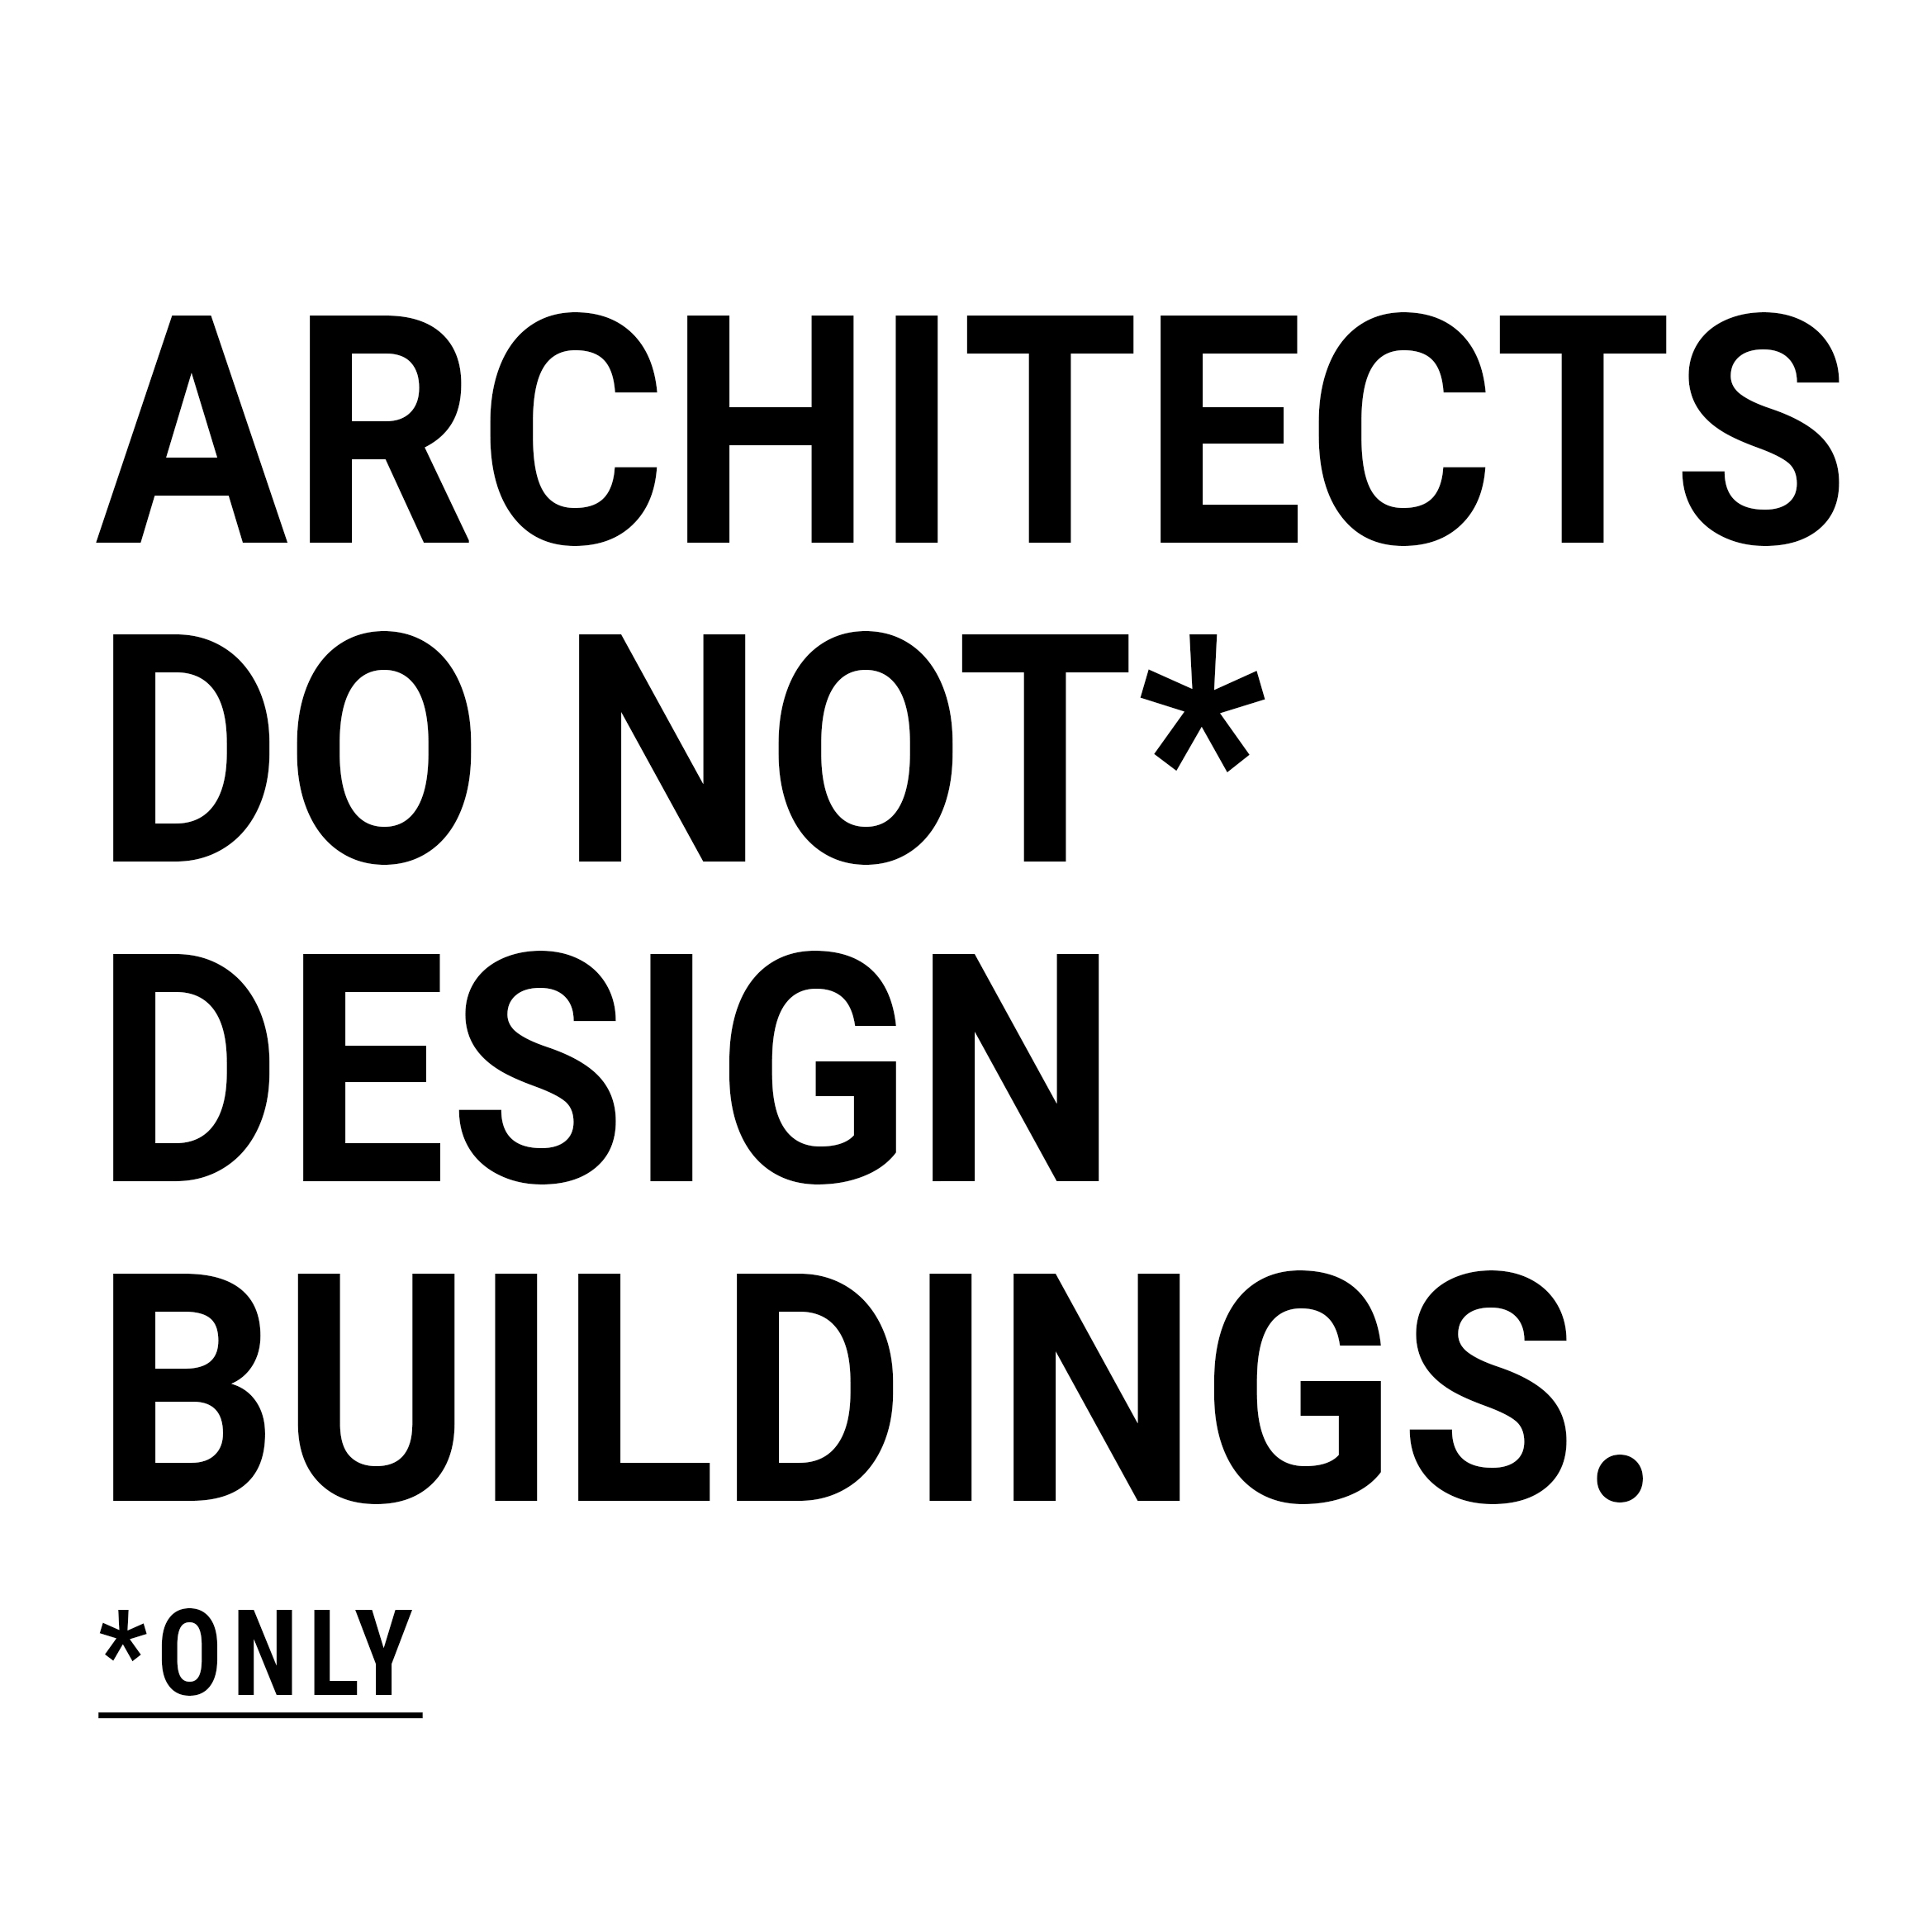 ARCHITECTS DO NOT DESIGN BUILDINGS.jpg